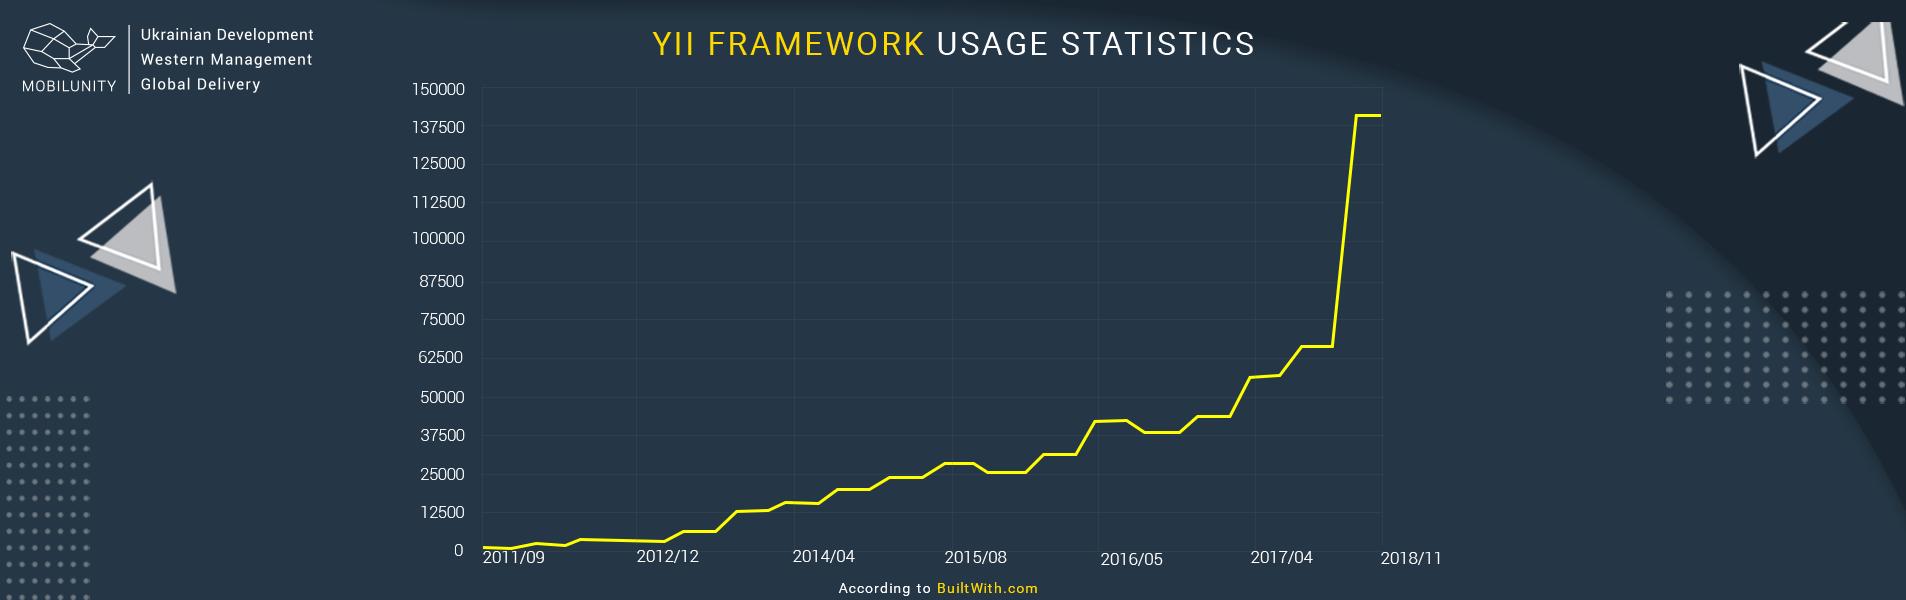 yii framework usage statistics